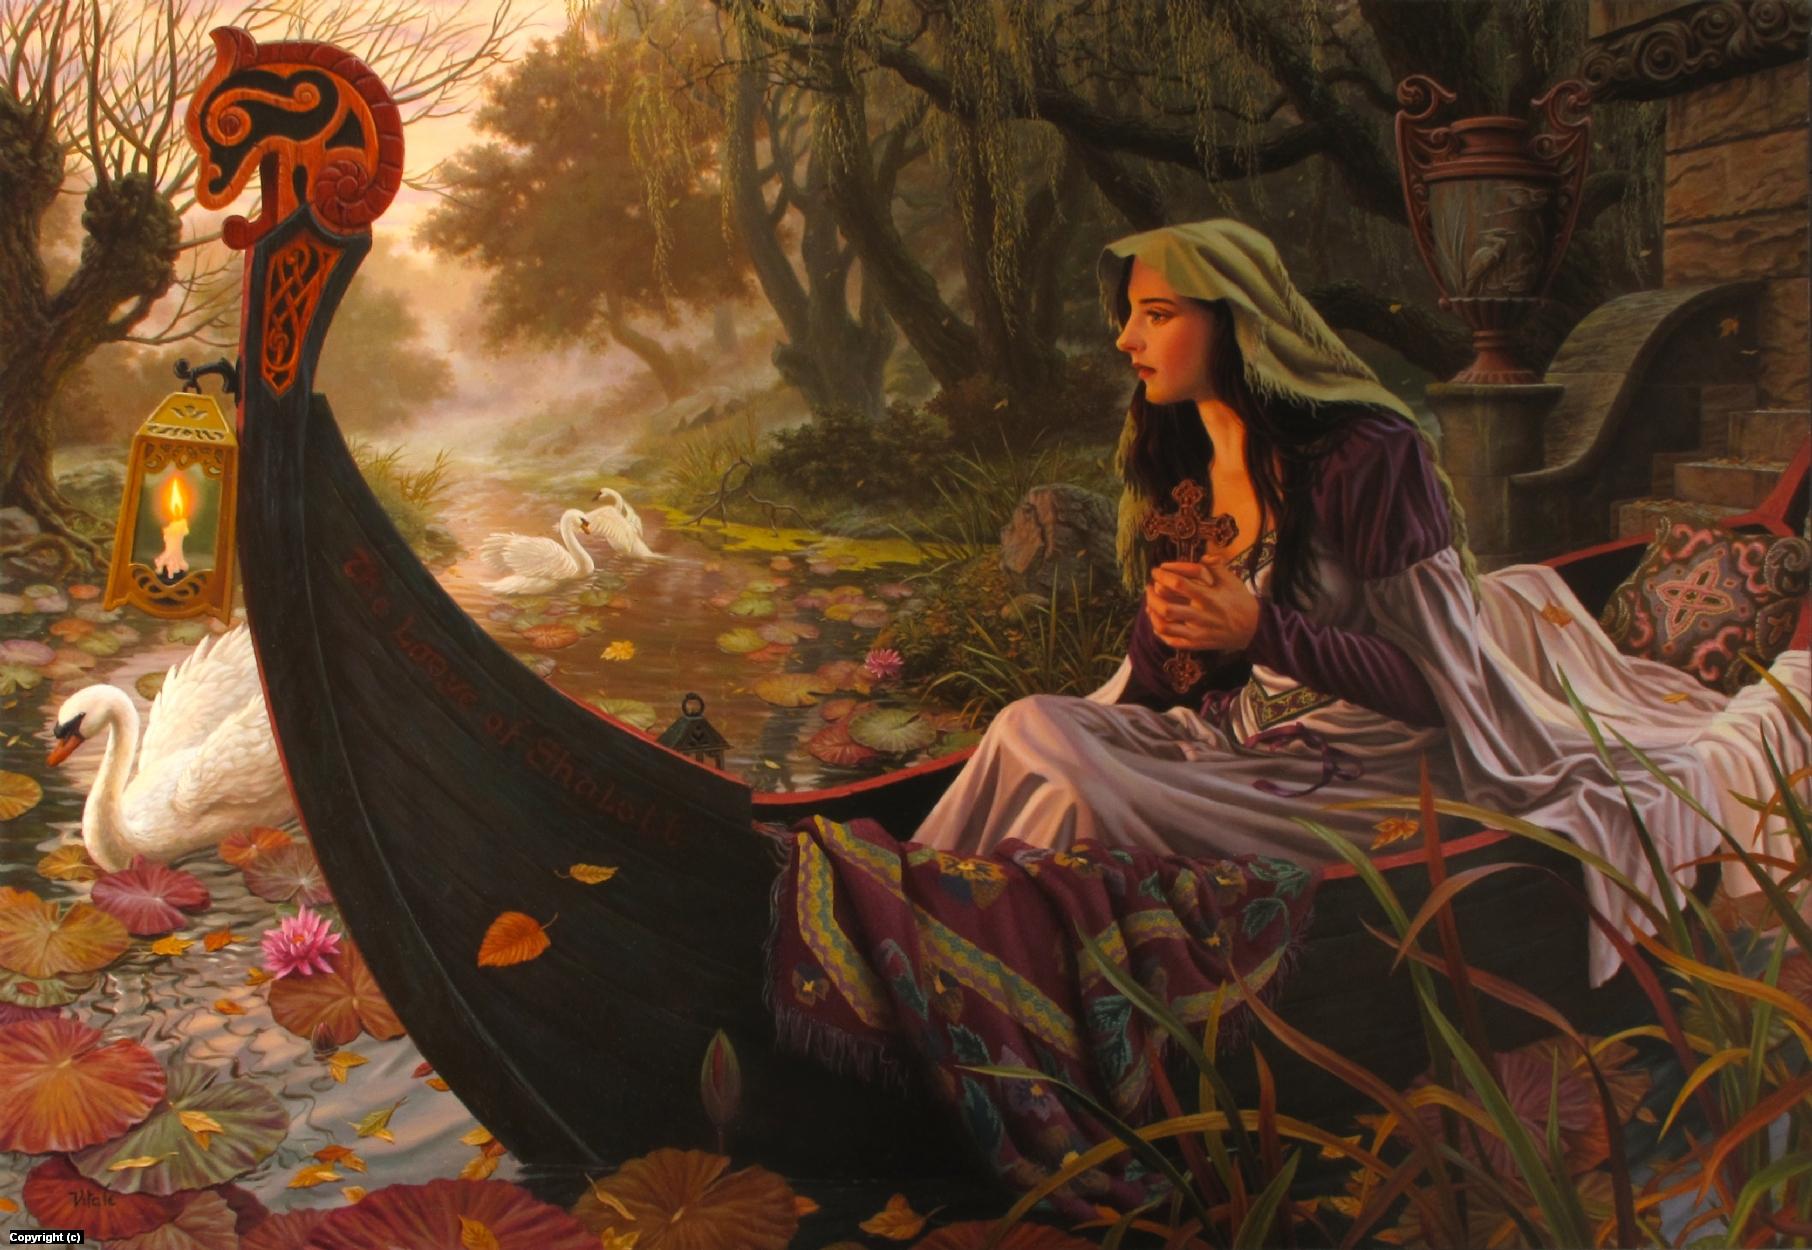 Lady of Shalott Artwork by raoul vitale